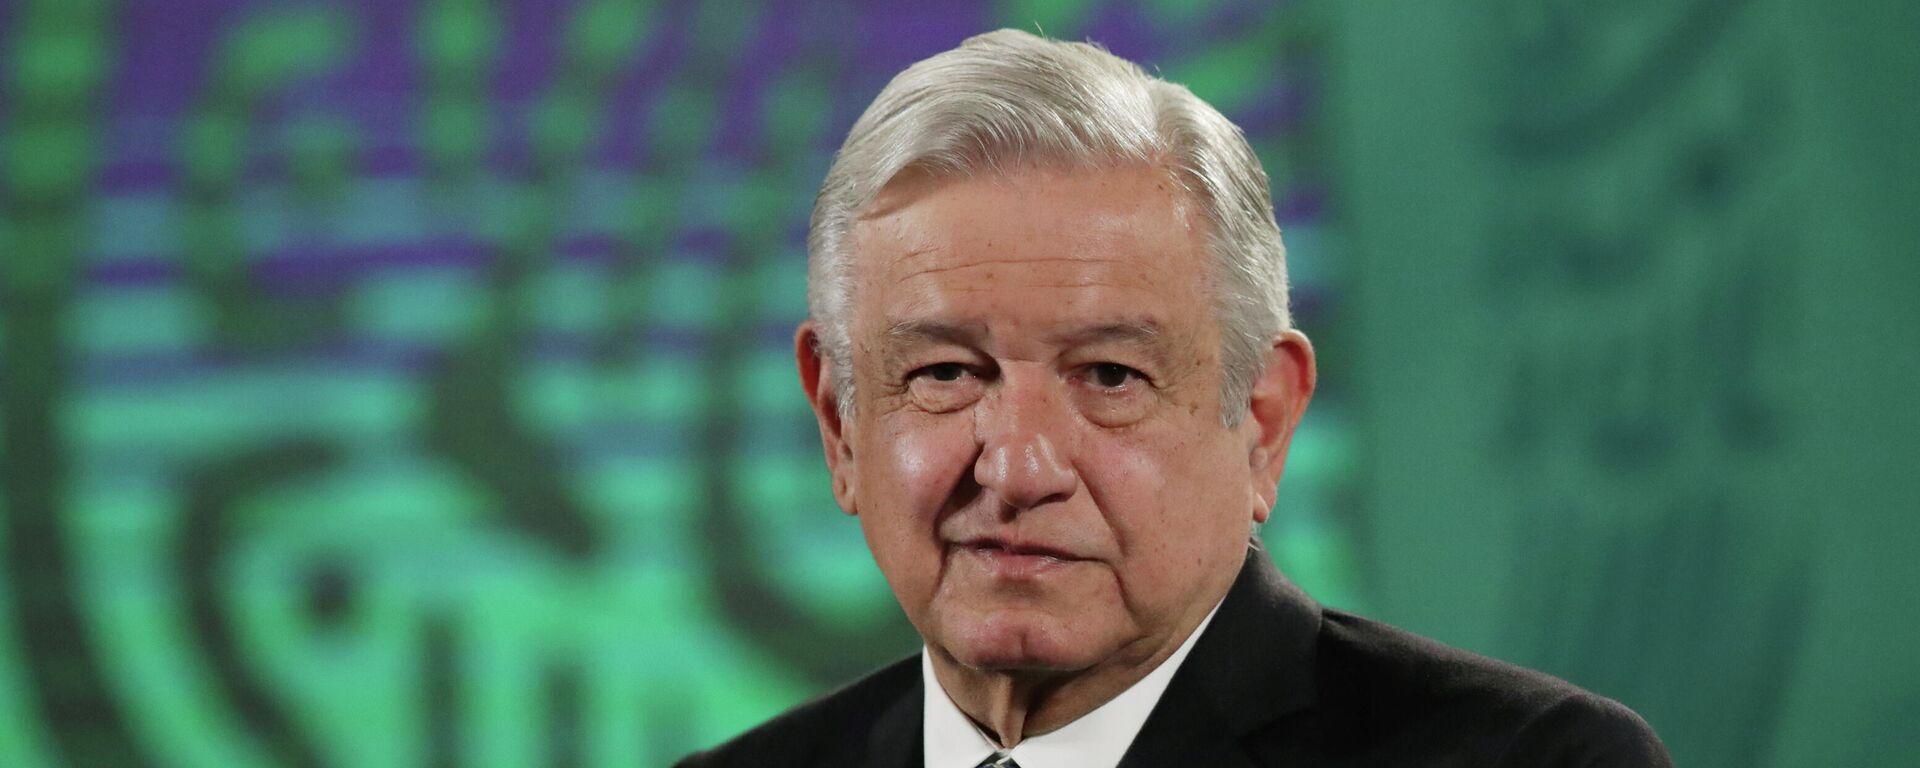 Andrés Manuel López Obrador, el presidente de México  - Sputnik Mundo, 1920, 03.06.2021